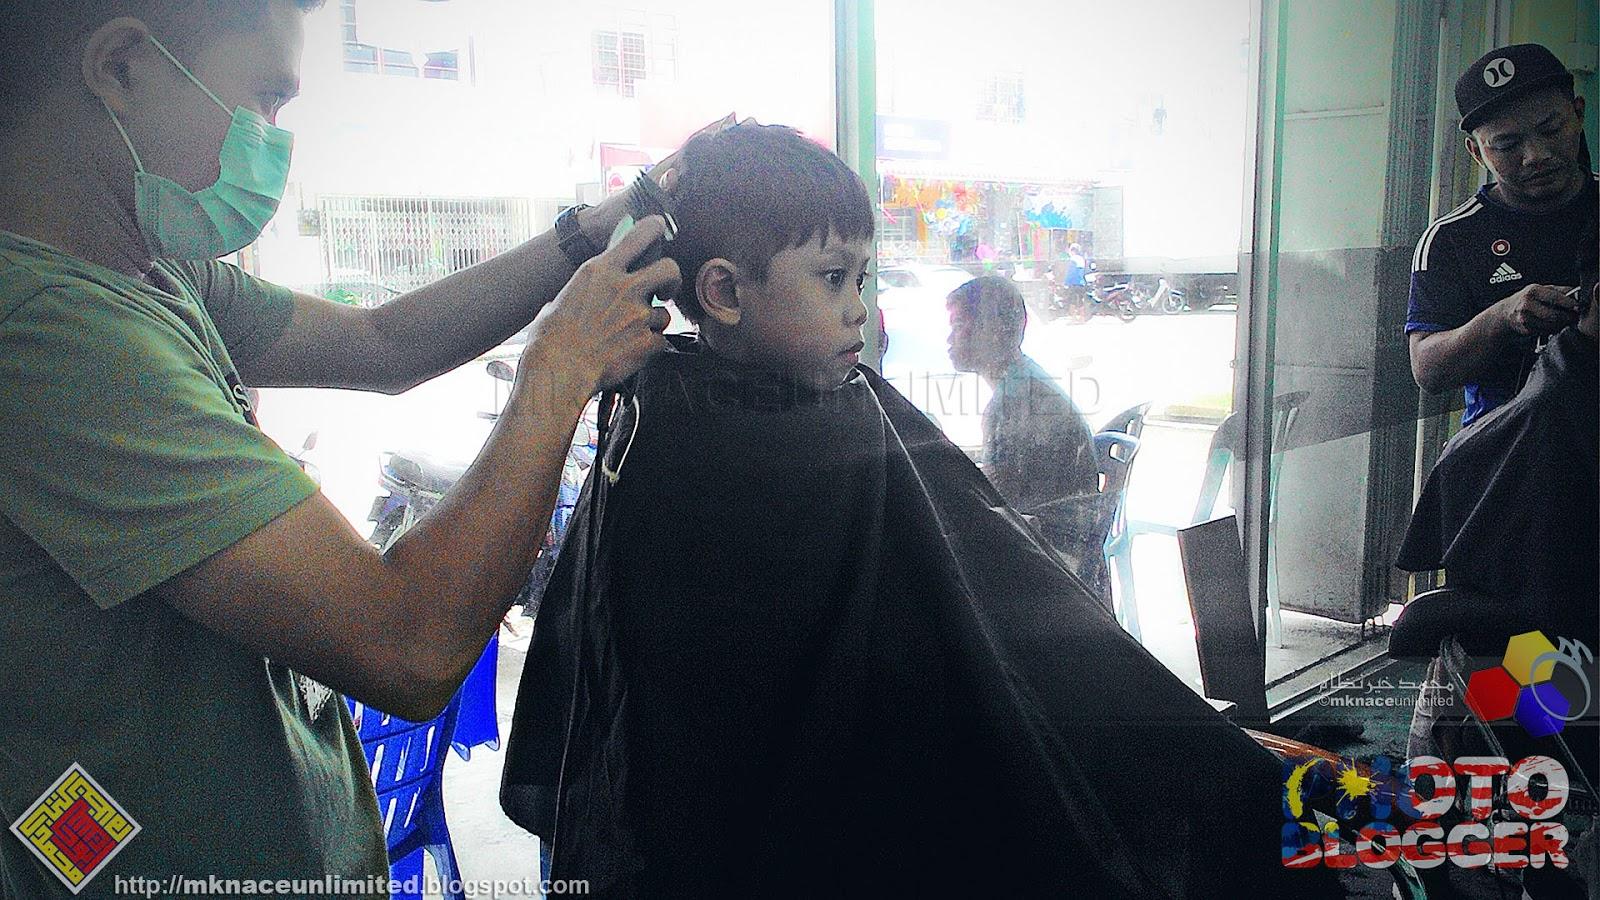 Rambut Raya di Aza Green Hairstyle. Tetiba ja mama soh gi potong rambut  anak beranak. Layan aje ler. Jarang bebeno aku gunting setakat rambut  sedang sedang ... 7605845ae7